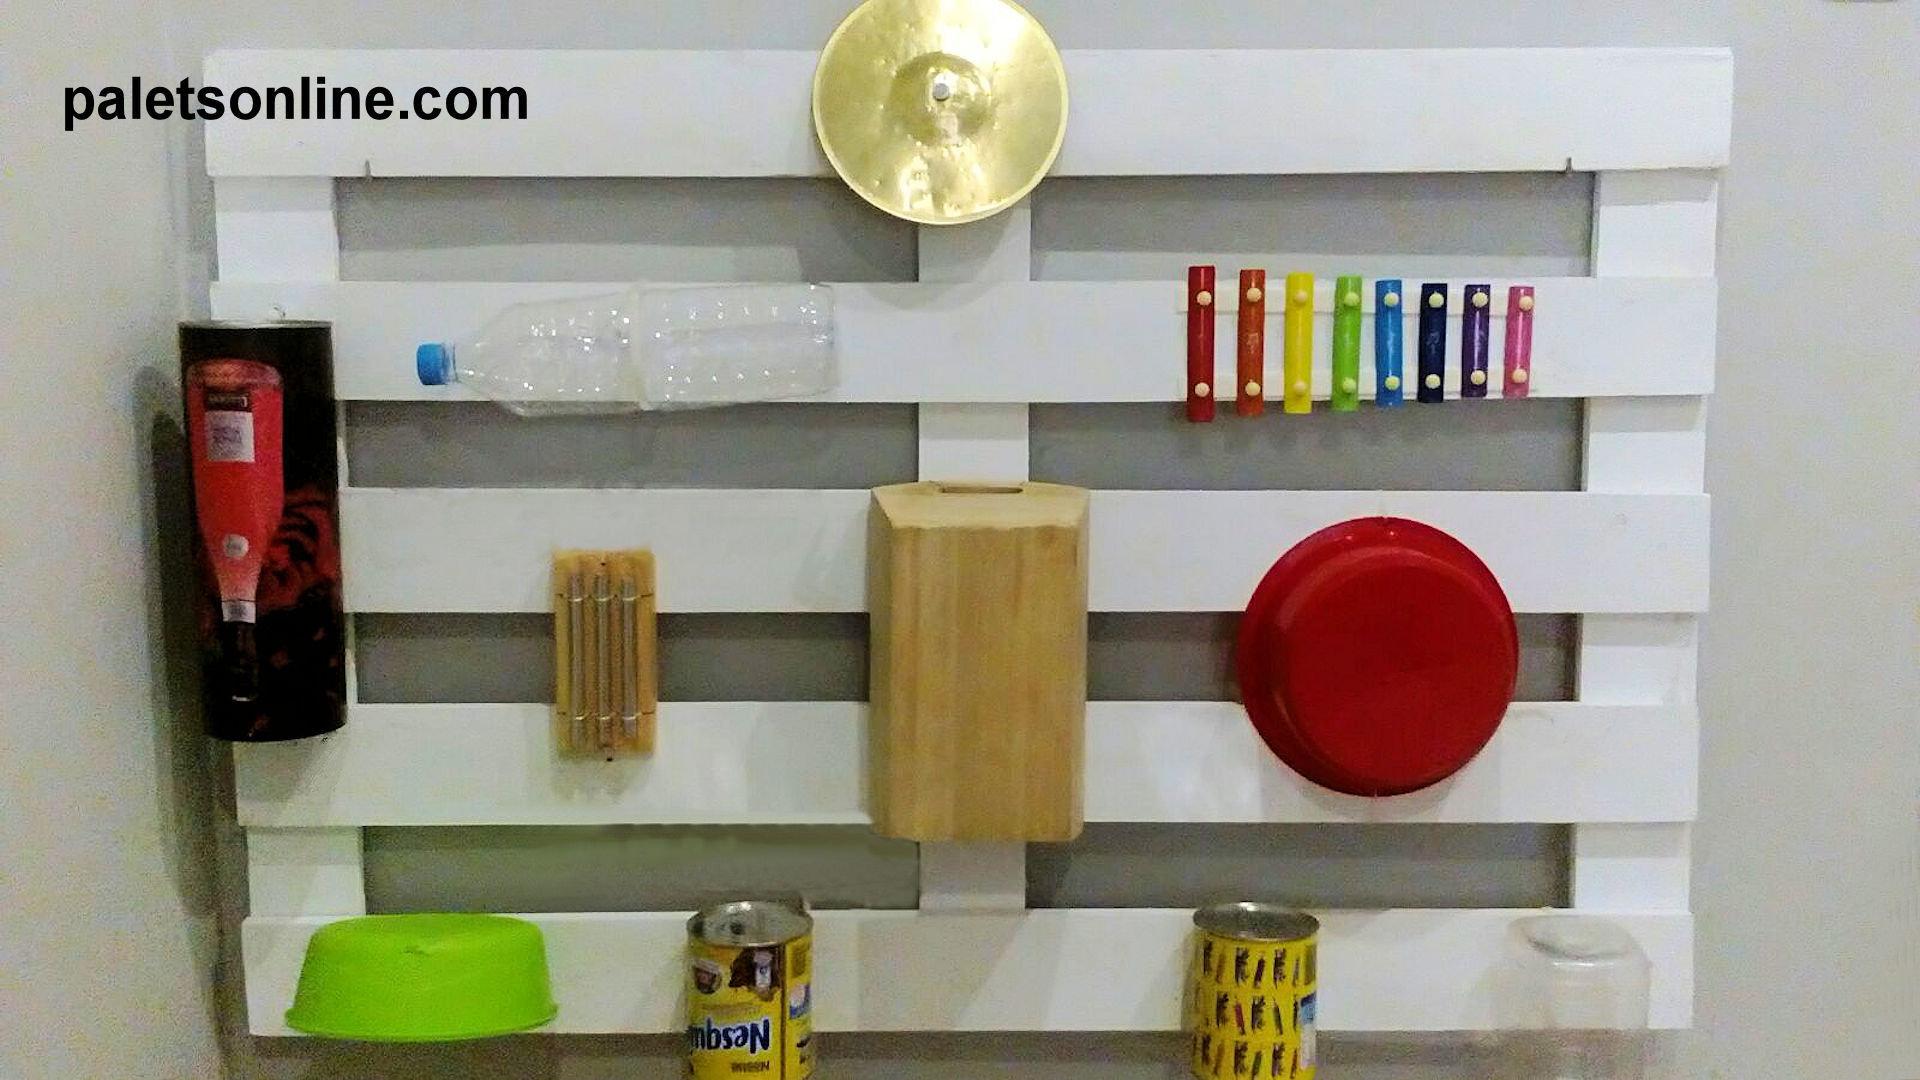 Comprar palets online good letra madera mod c mundigangas - Comprar muebles palets ...